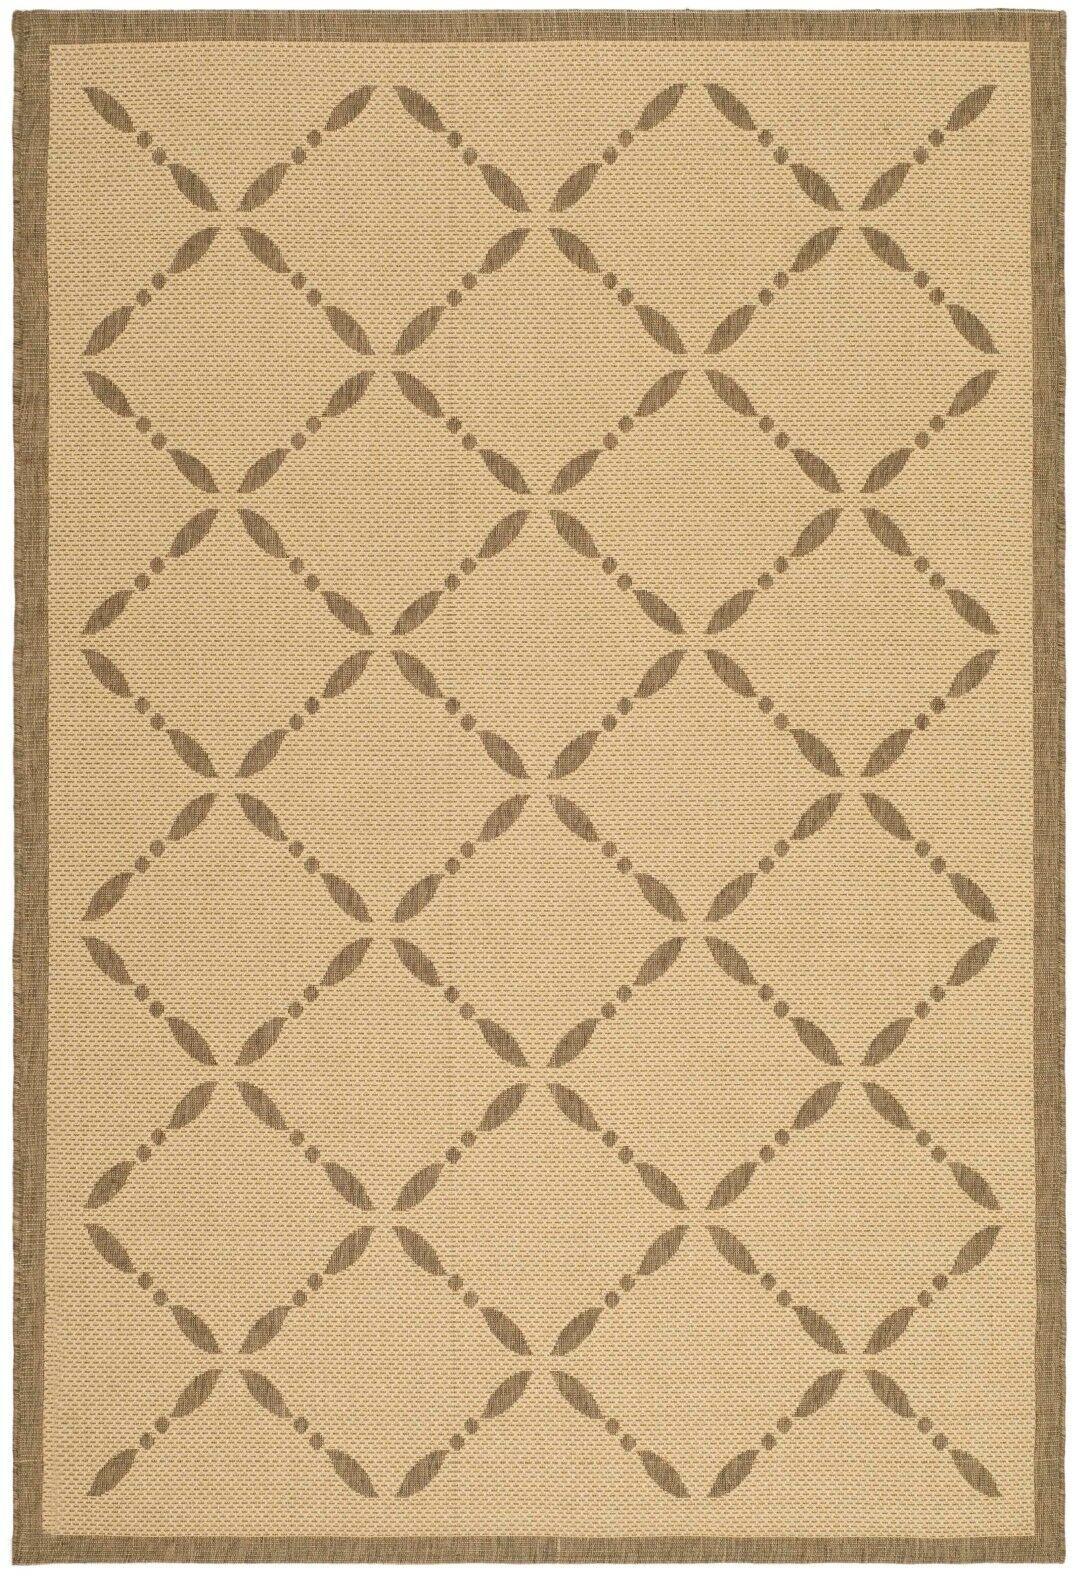 Martha Stewart Creme/Brown Area Rug Rug Size: Rectangle 4' x 5'7